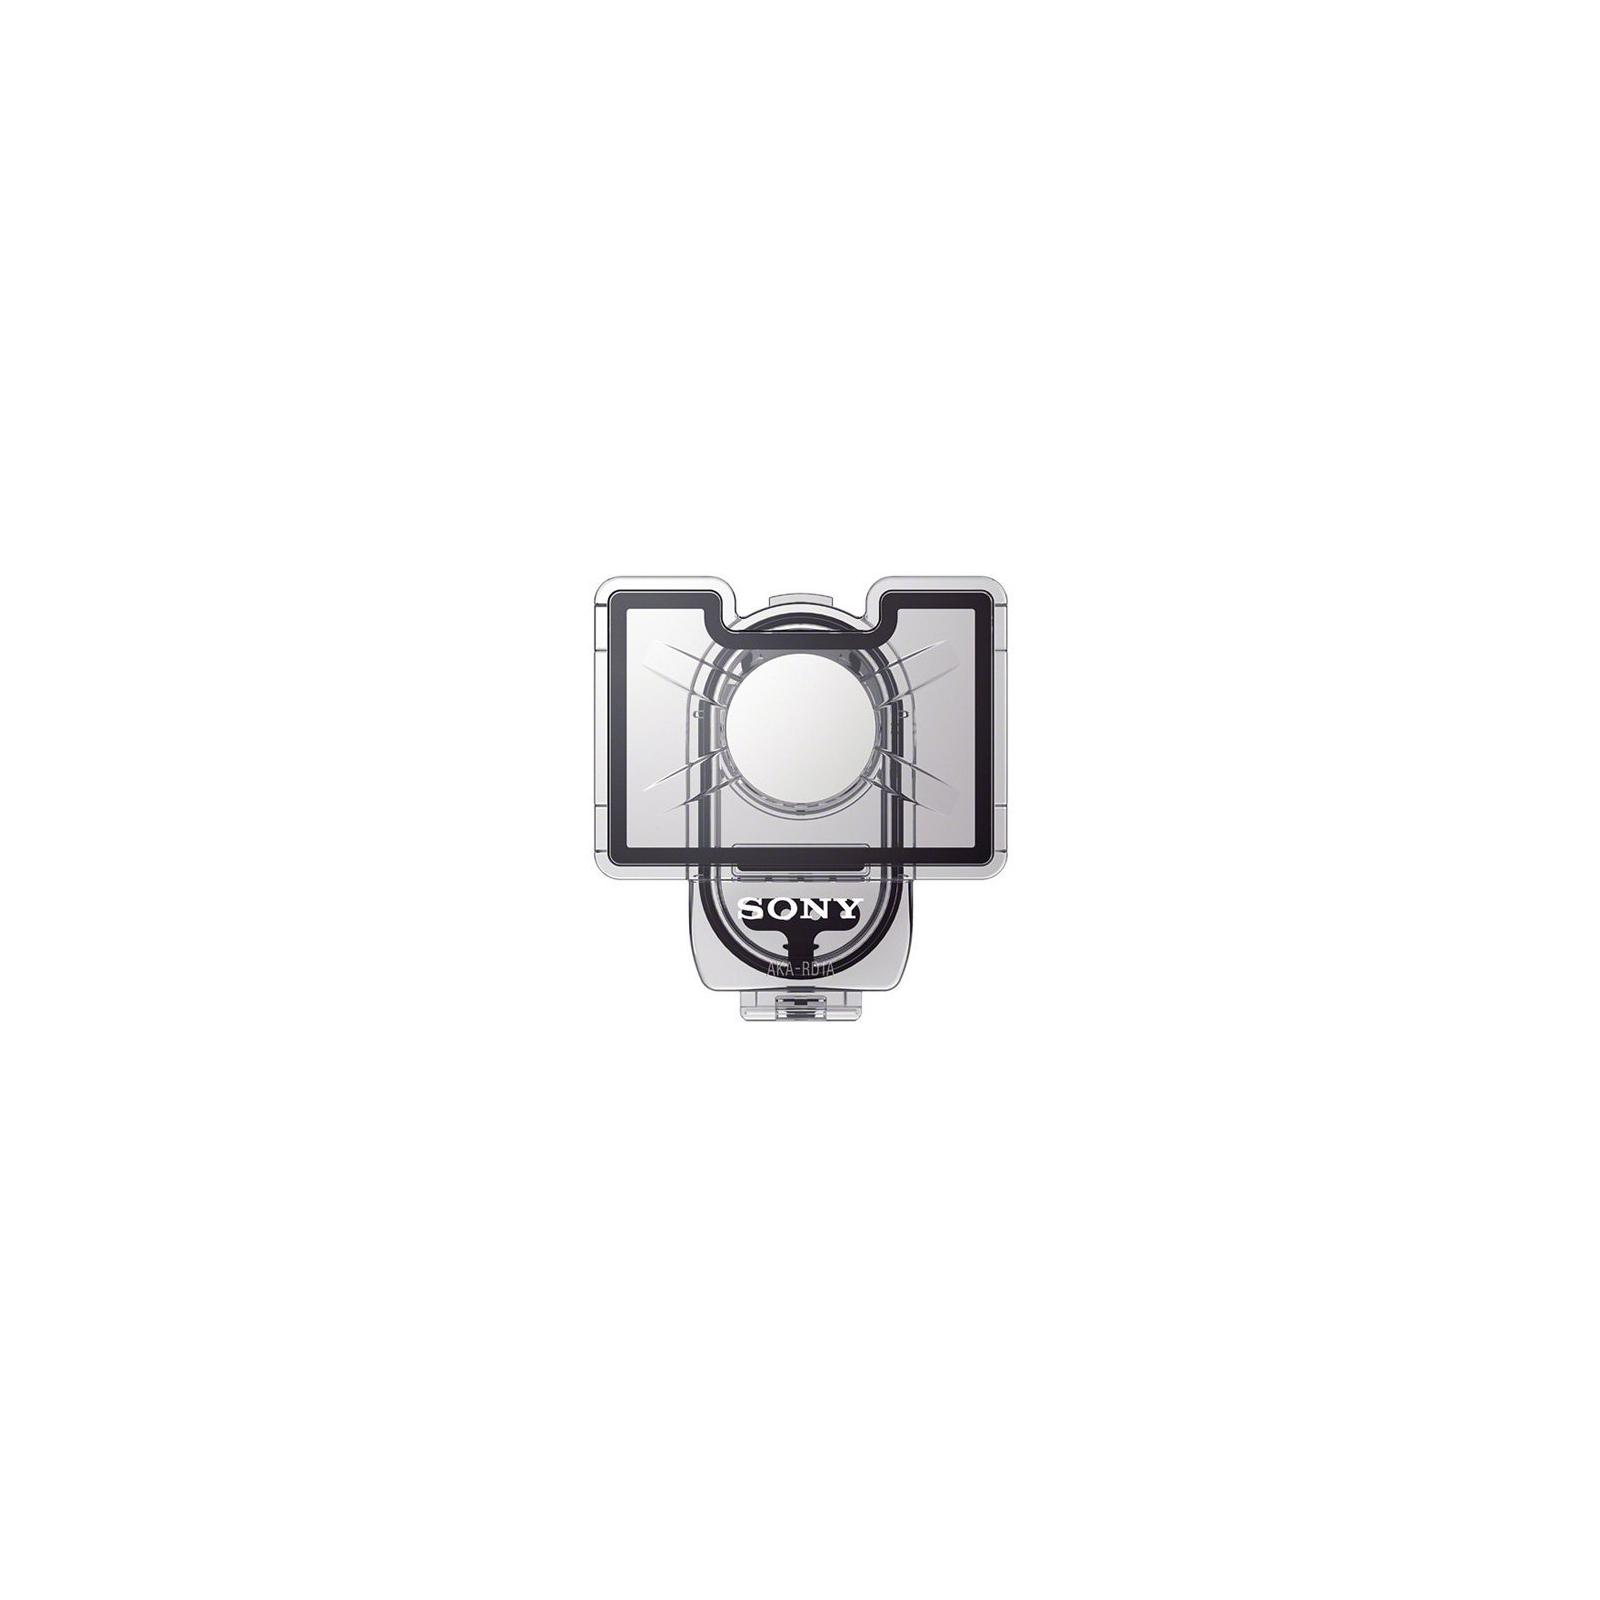 Комплект SONY AKA-RD1 (AKARD1.SYH) изображение 2